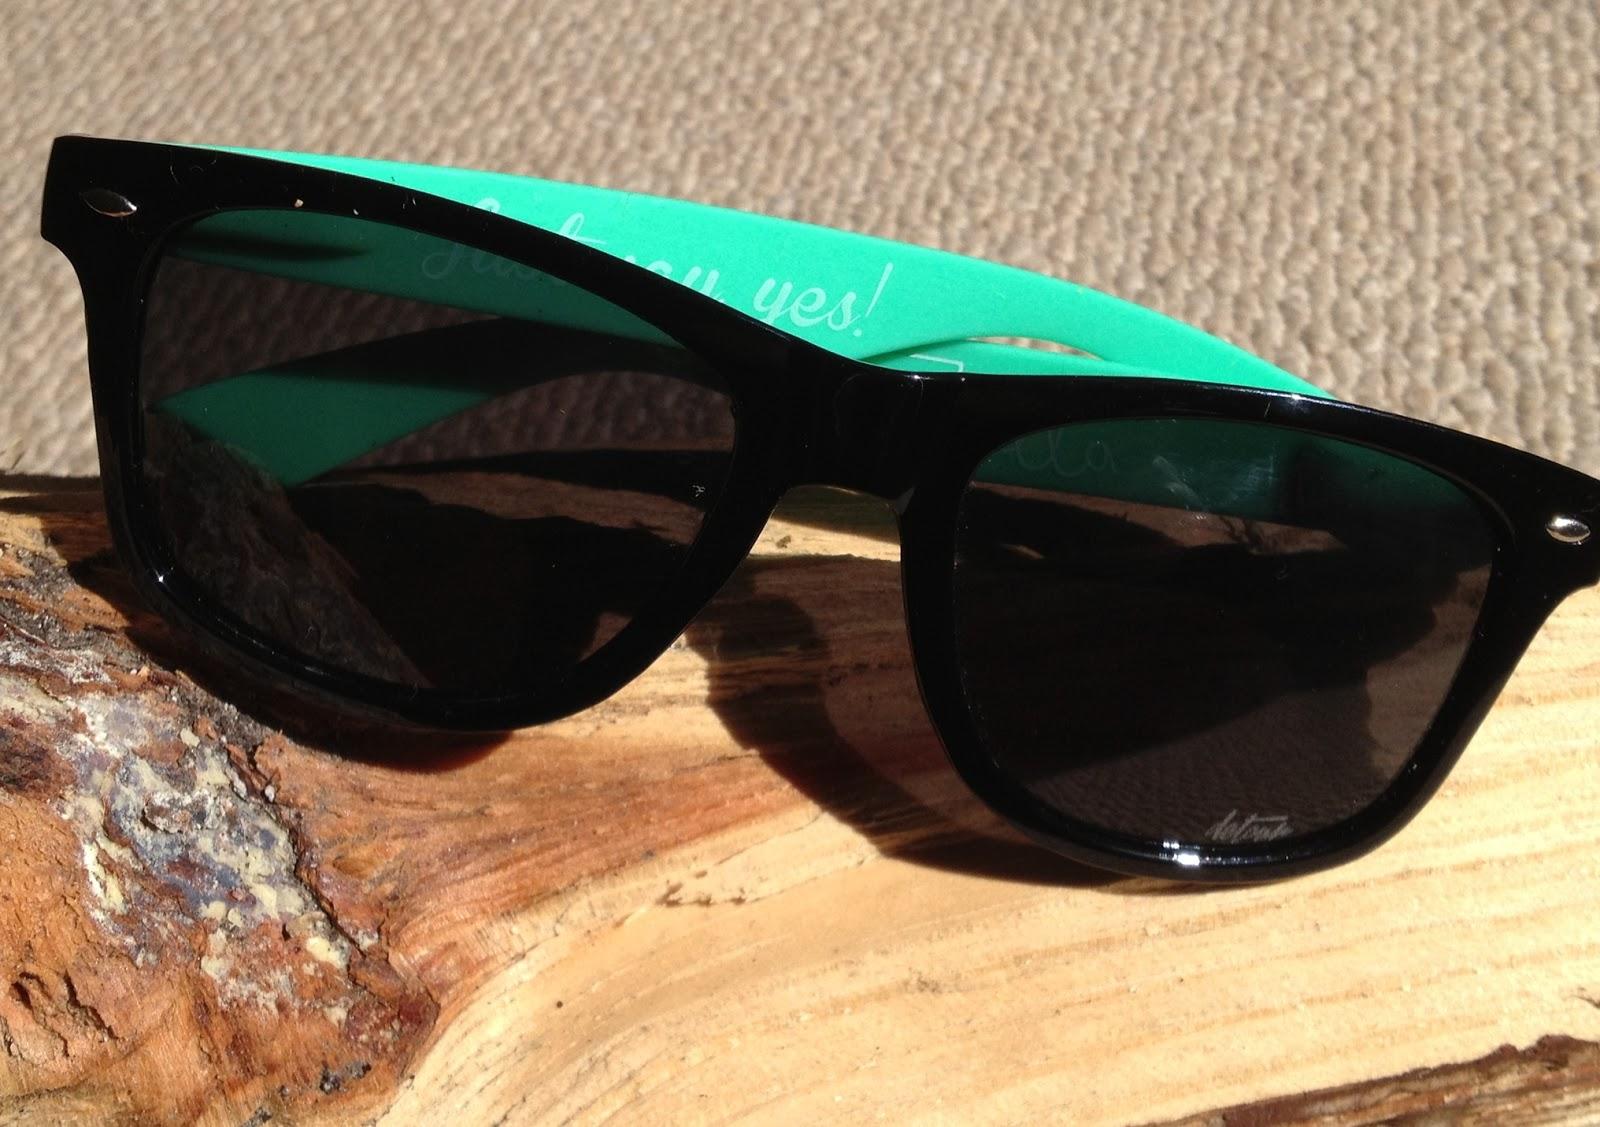 c4f82438d7 Zoella Detour Sunglasses